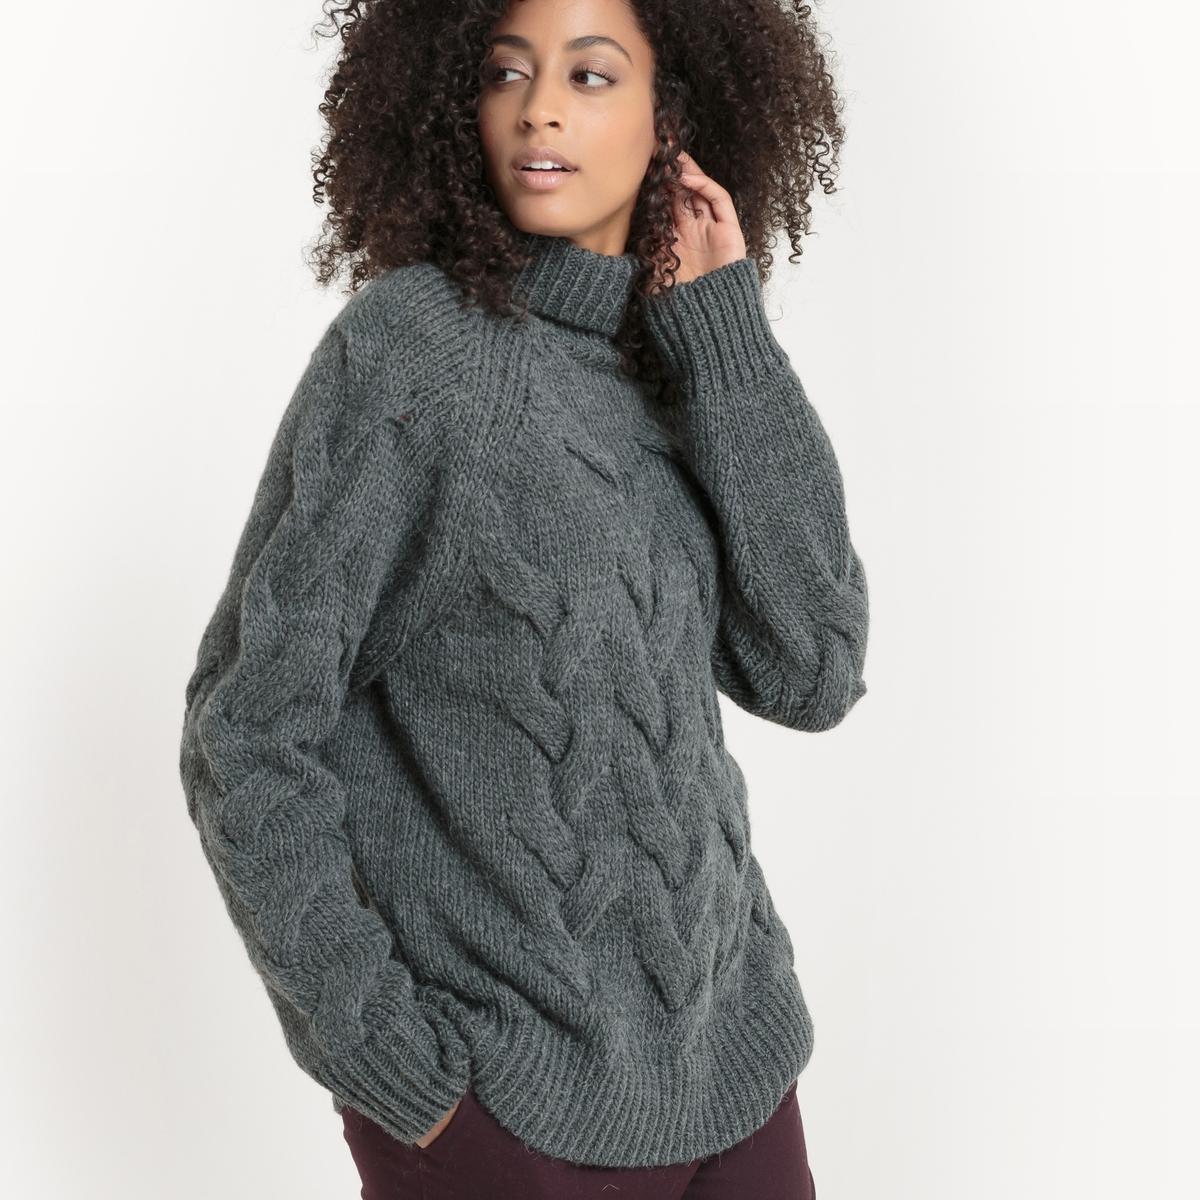 Пуловер, вязка косичка